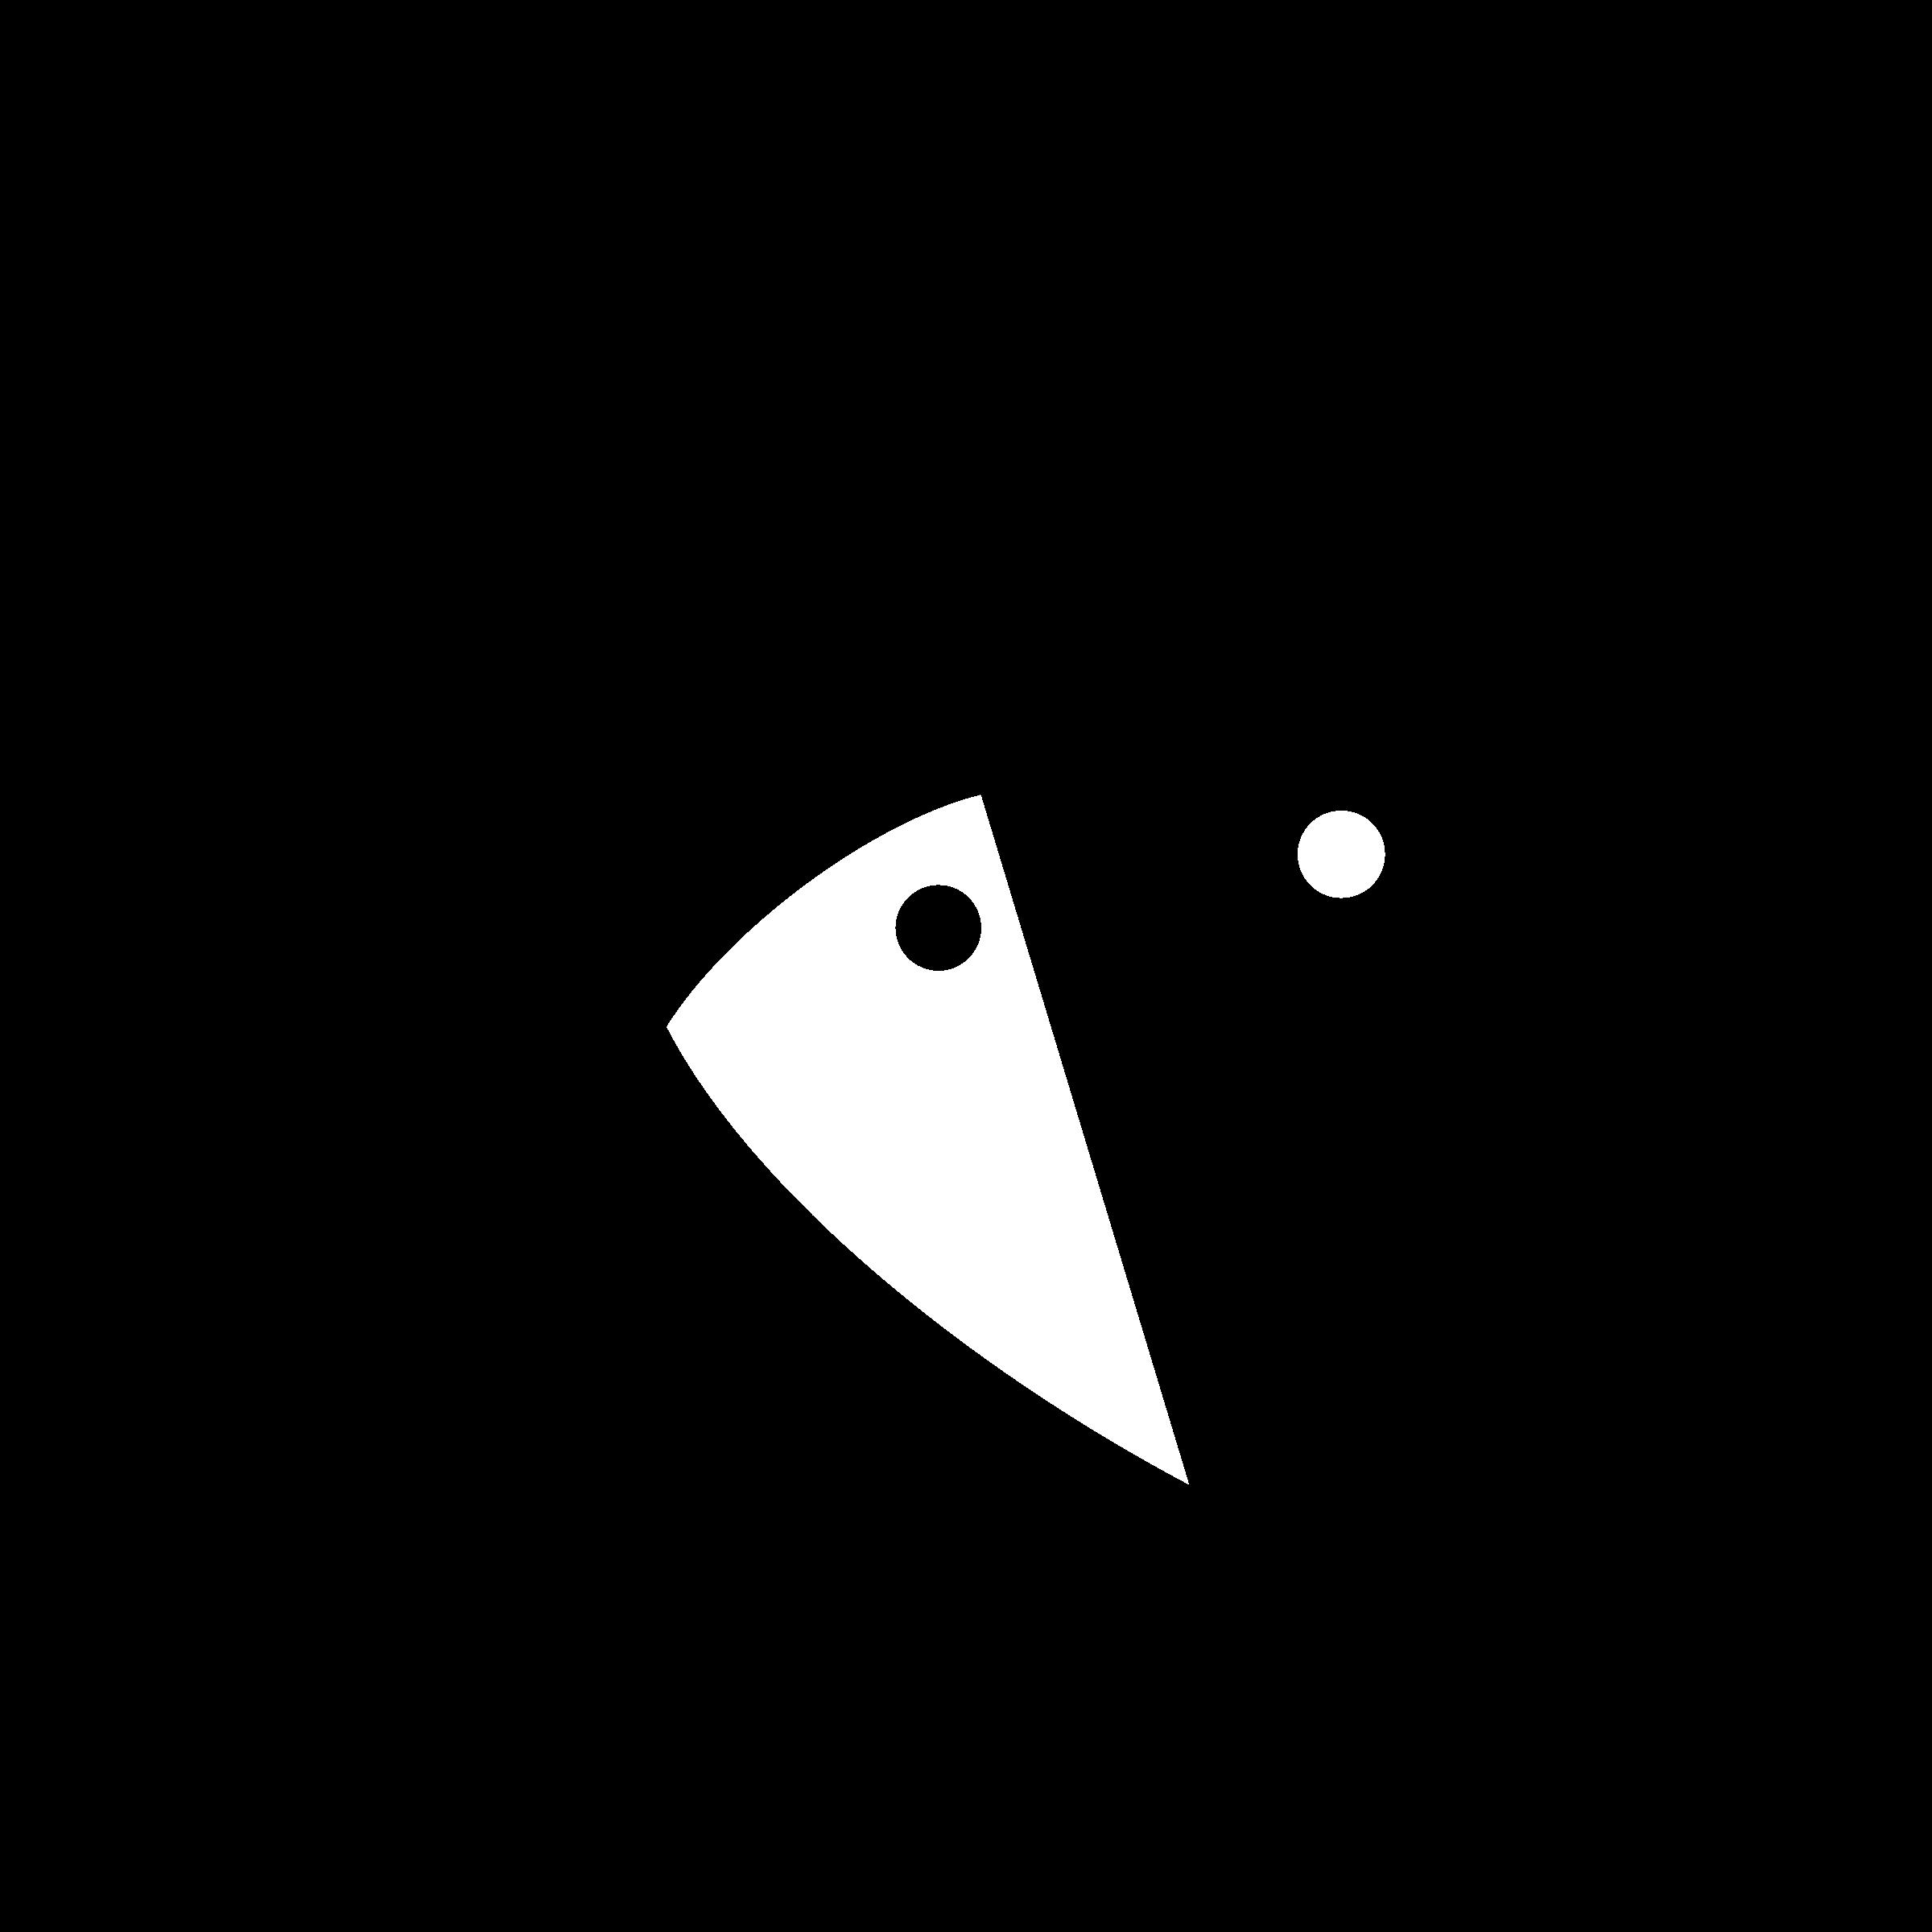 Galaxy clipart monochrome. Logo png transparent svg